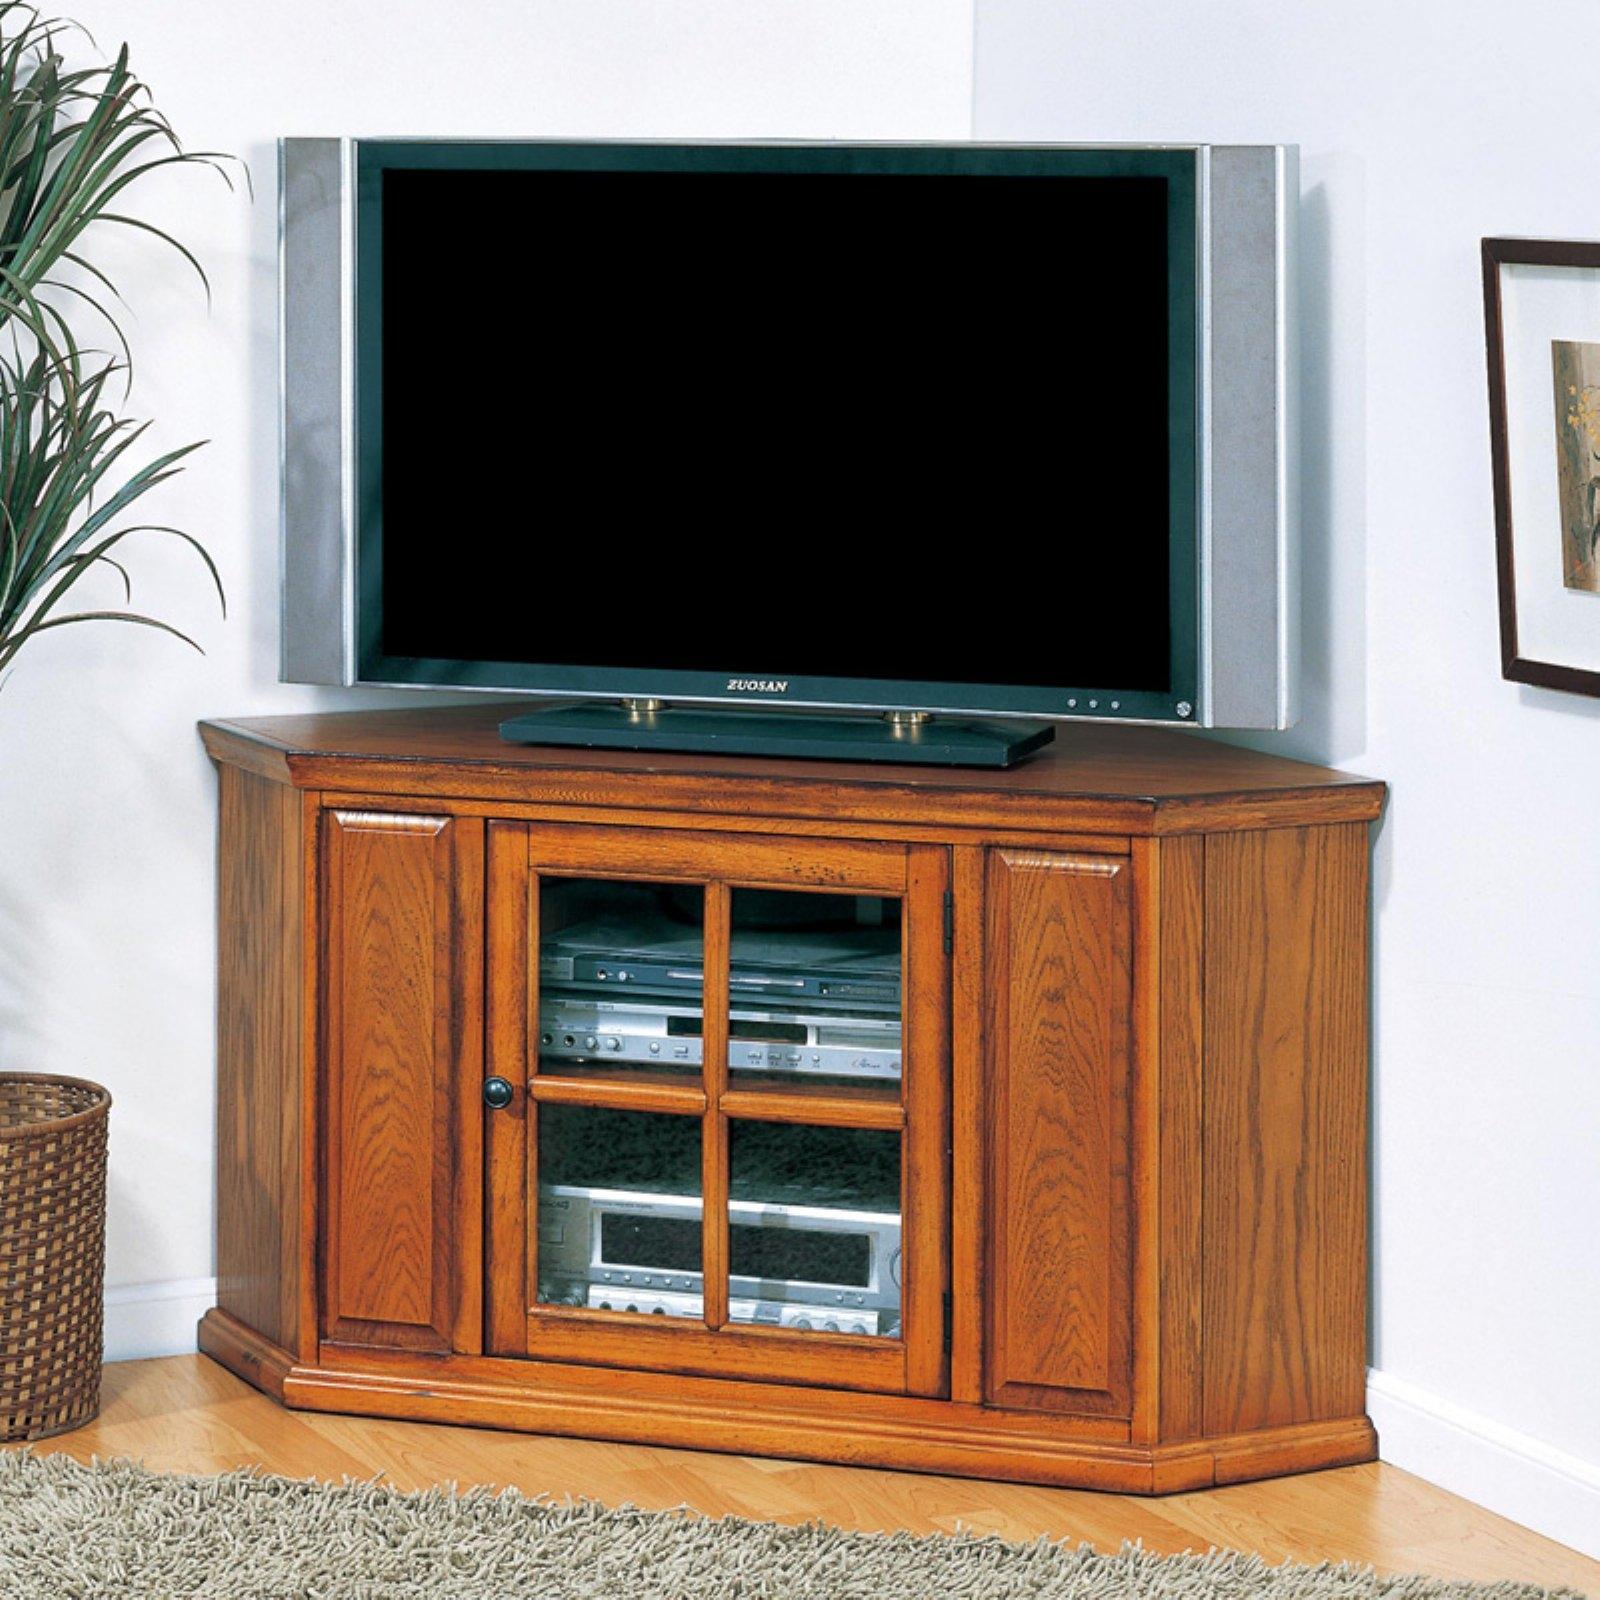 Leick Leick 88285 Riley Holliday Oak 46 In. Corner TV Console